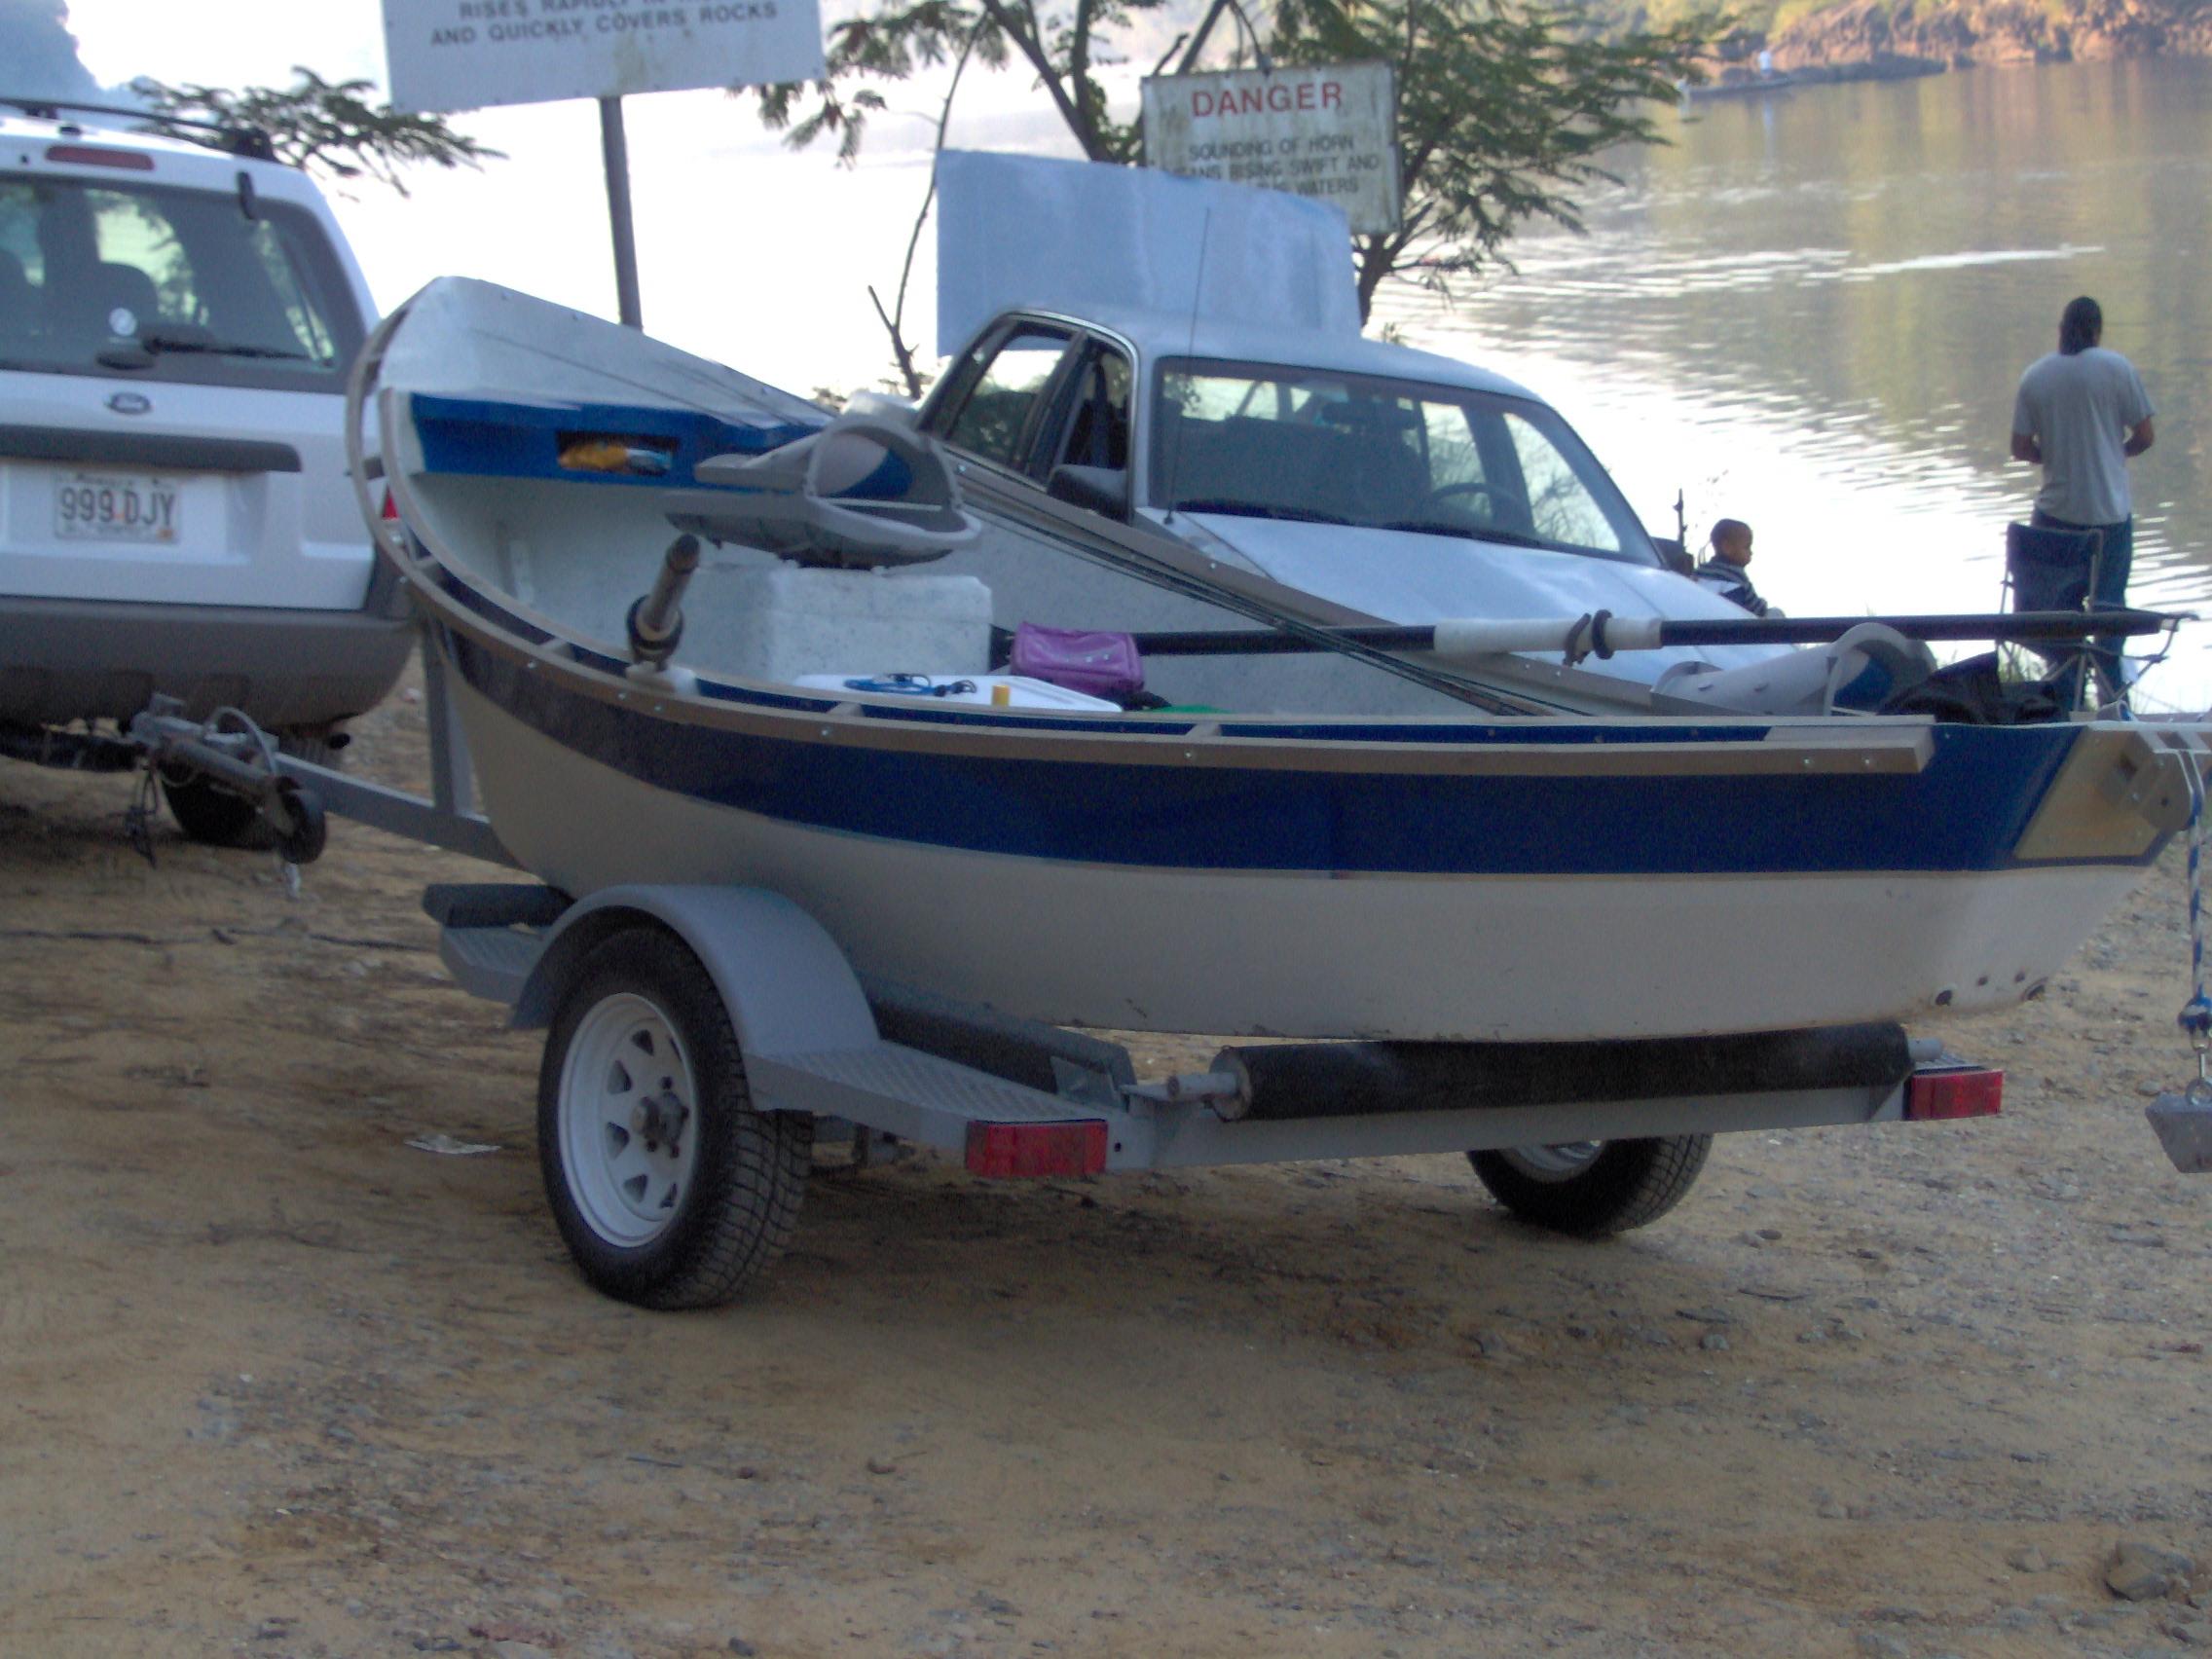 Stolen Drift Boat